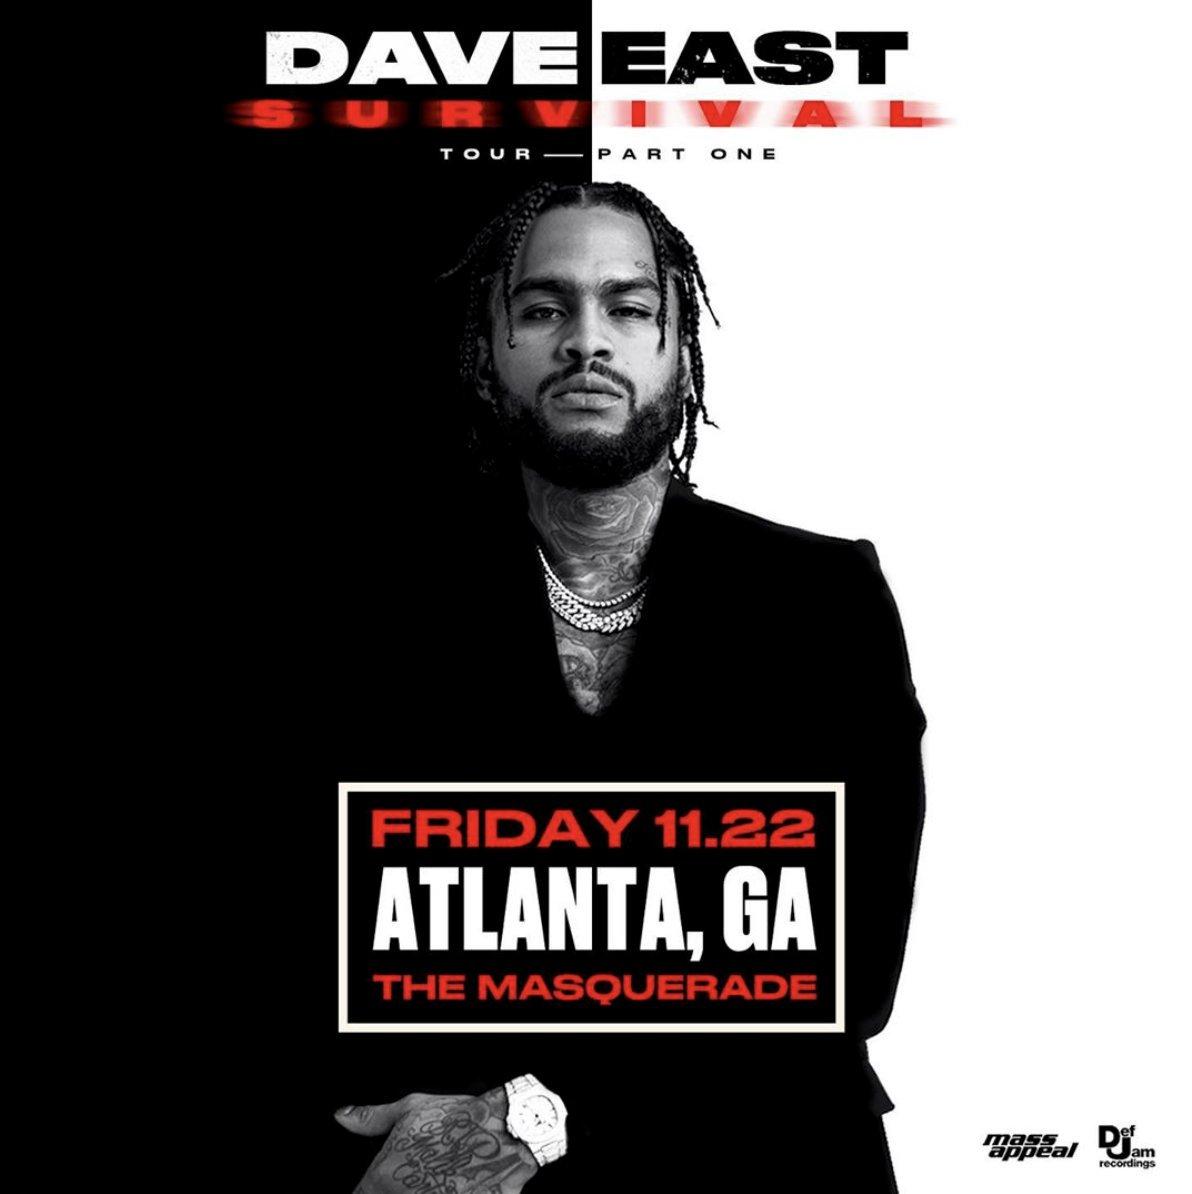 Dave East On Twitter Tour Start Tomorrow Atl Let S Go